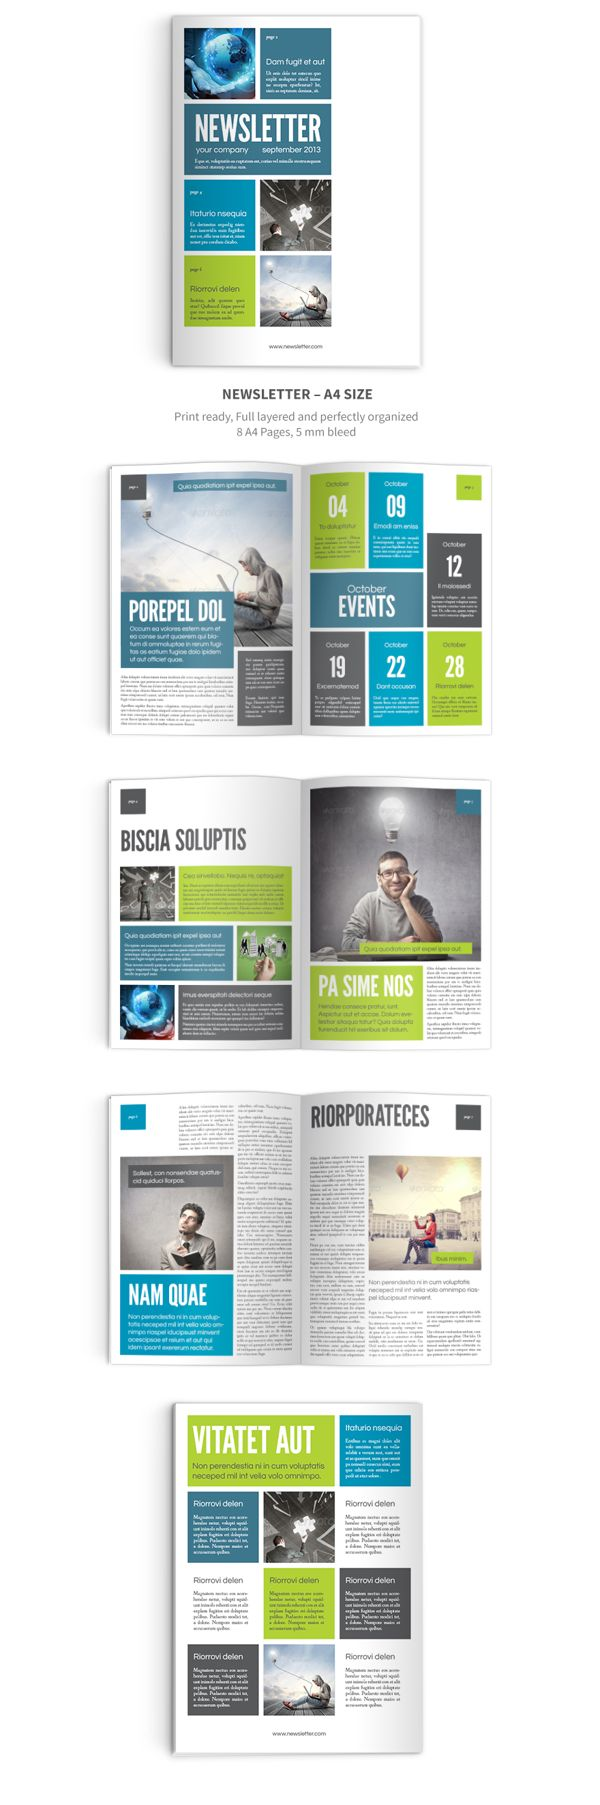 Newsletter Indesign Template by Jan Styblo , via Behance